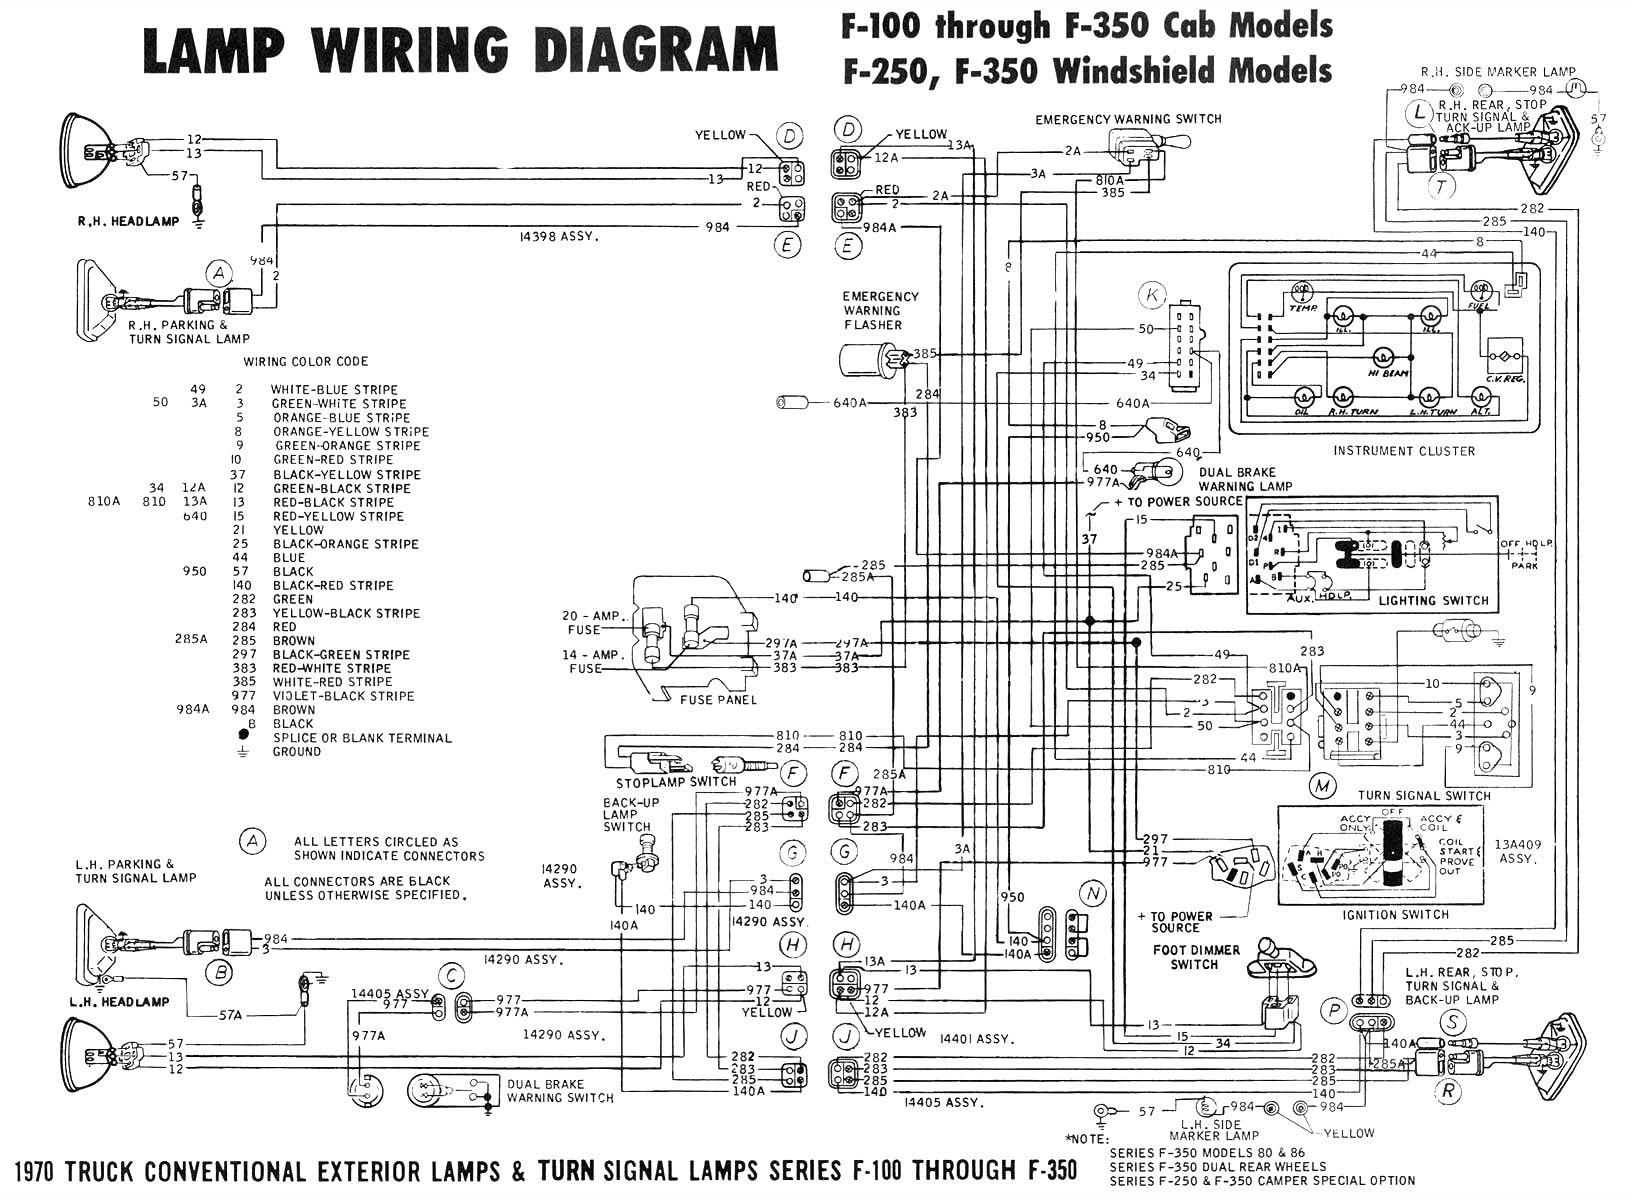 1994 ford F250 Wiring Diagram ford F250 Wiring Diagram for Trailer Light Electrical